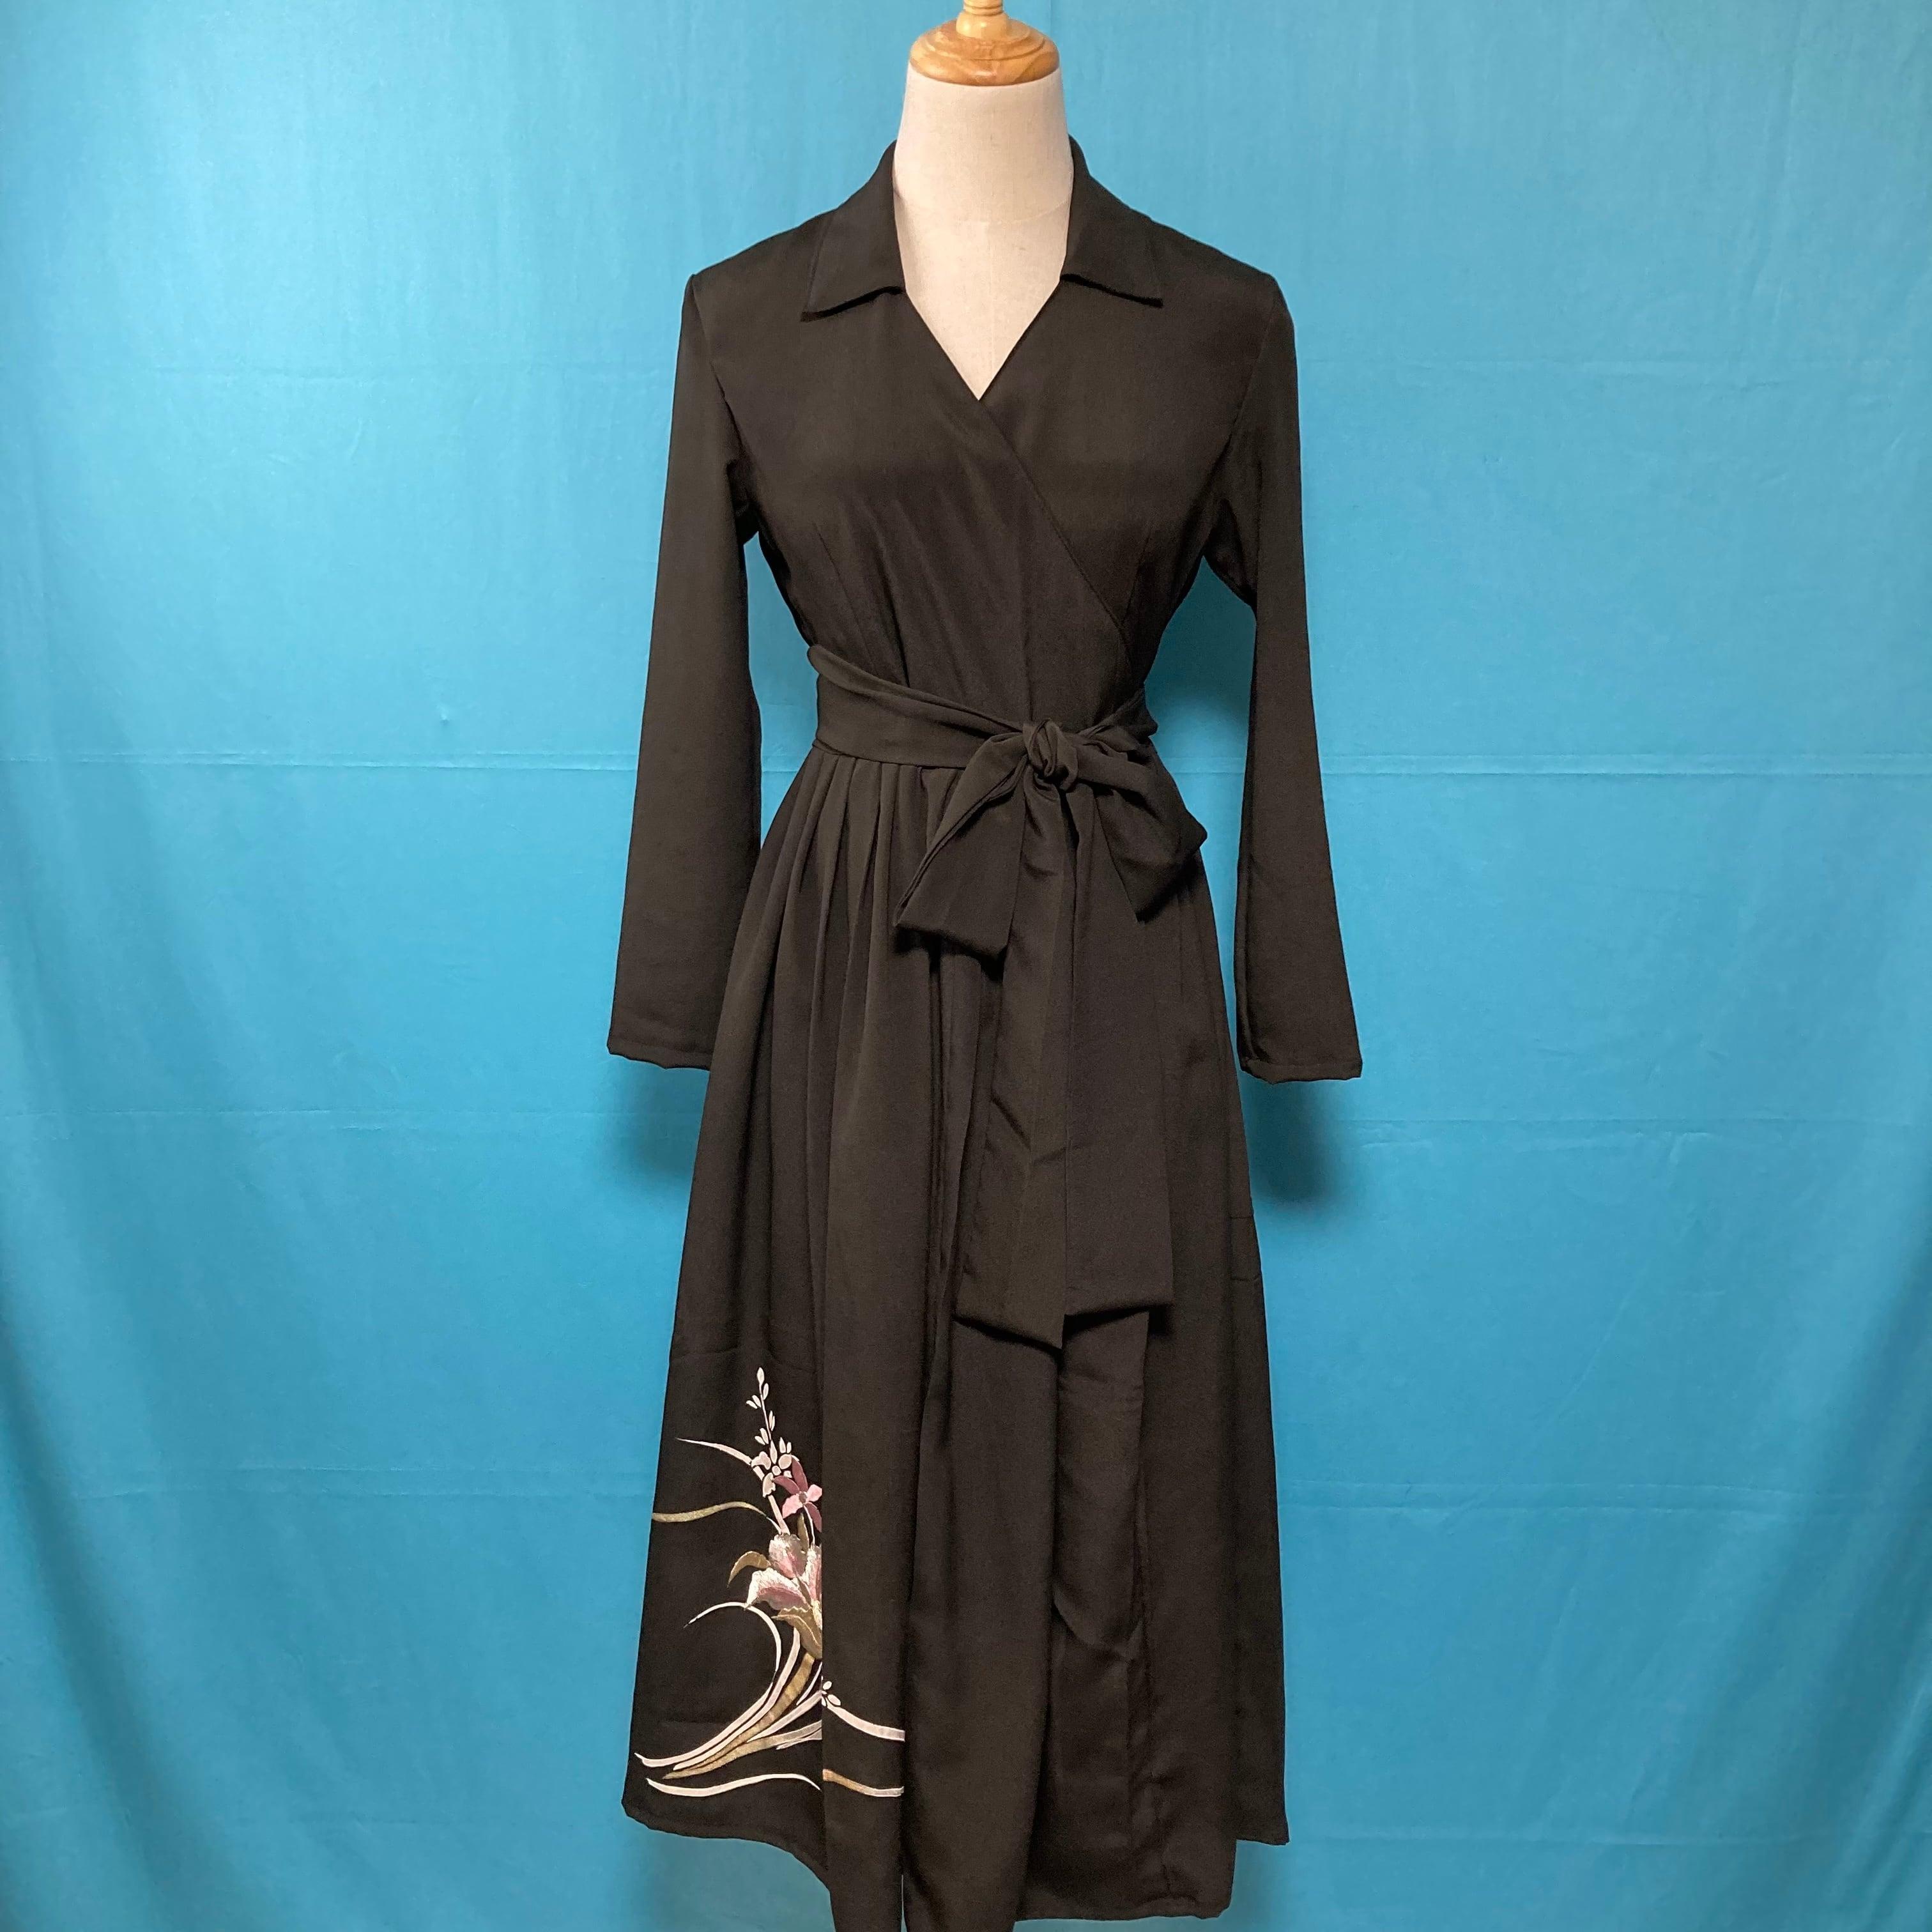 Vintage black embroidery kimono dress/ US 6